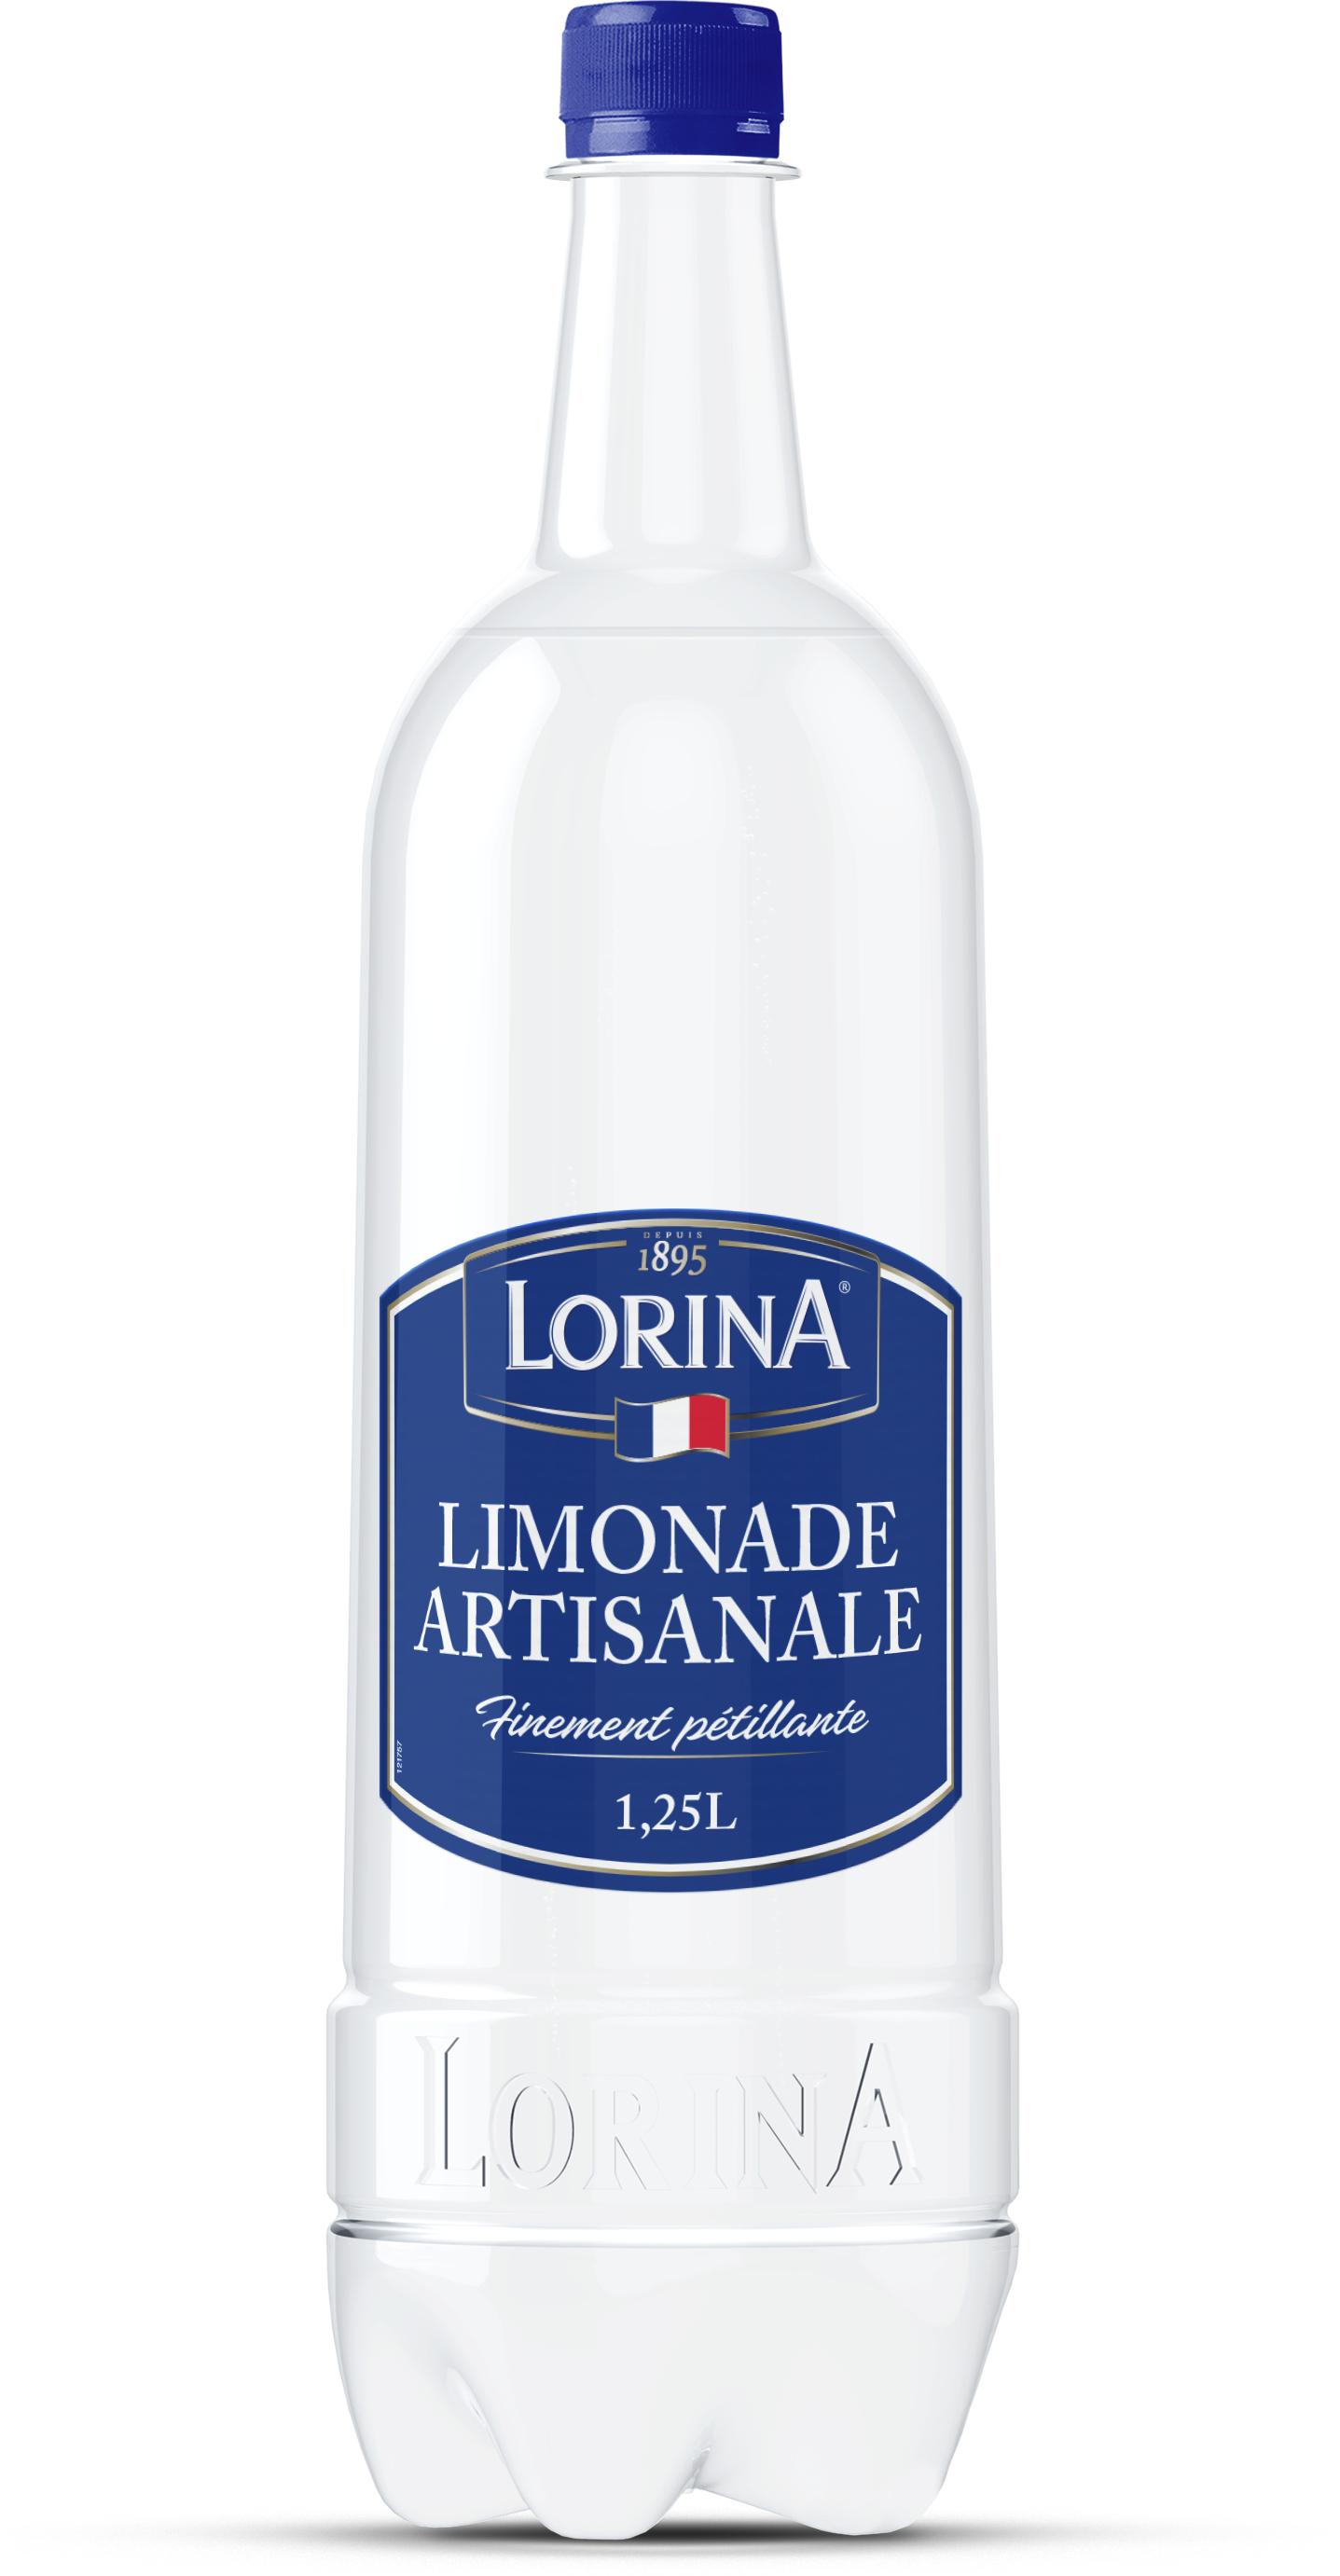 Limonade artisanale, Lorina (1.25 L)